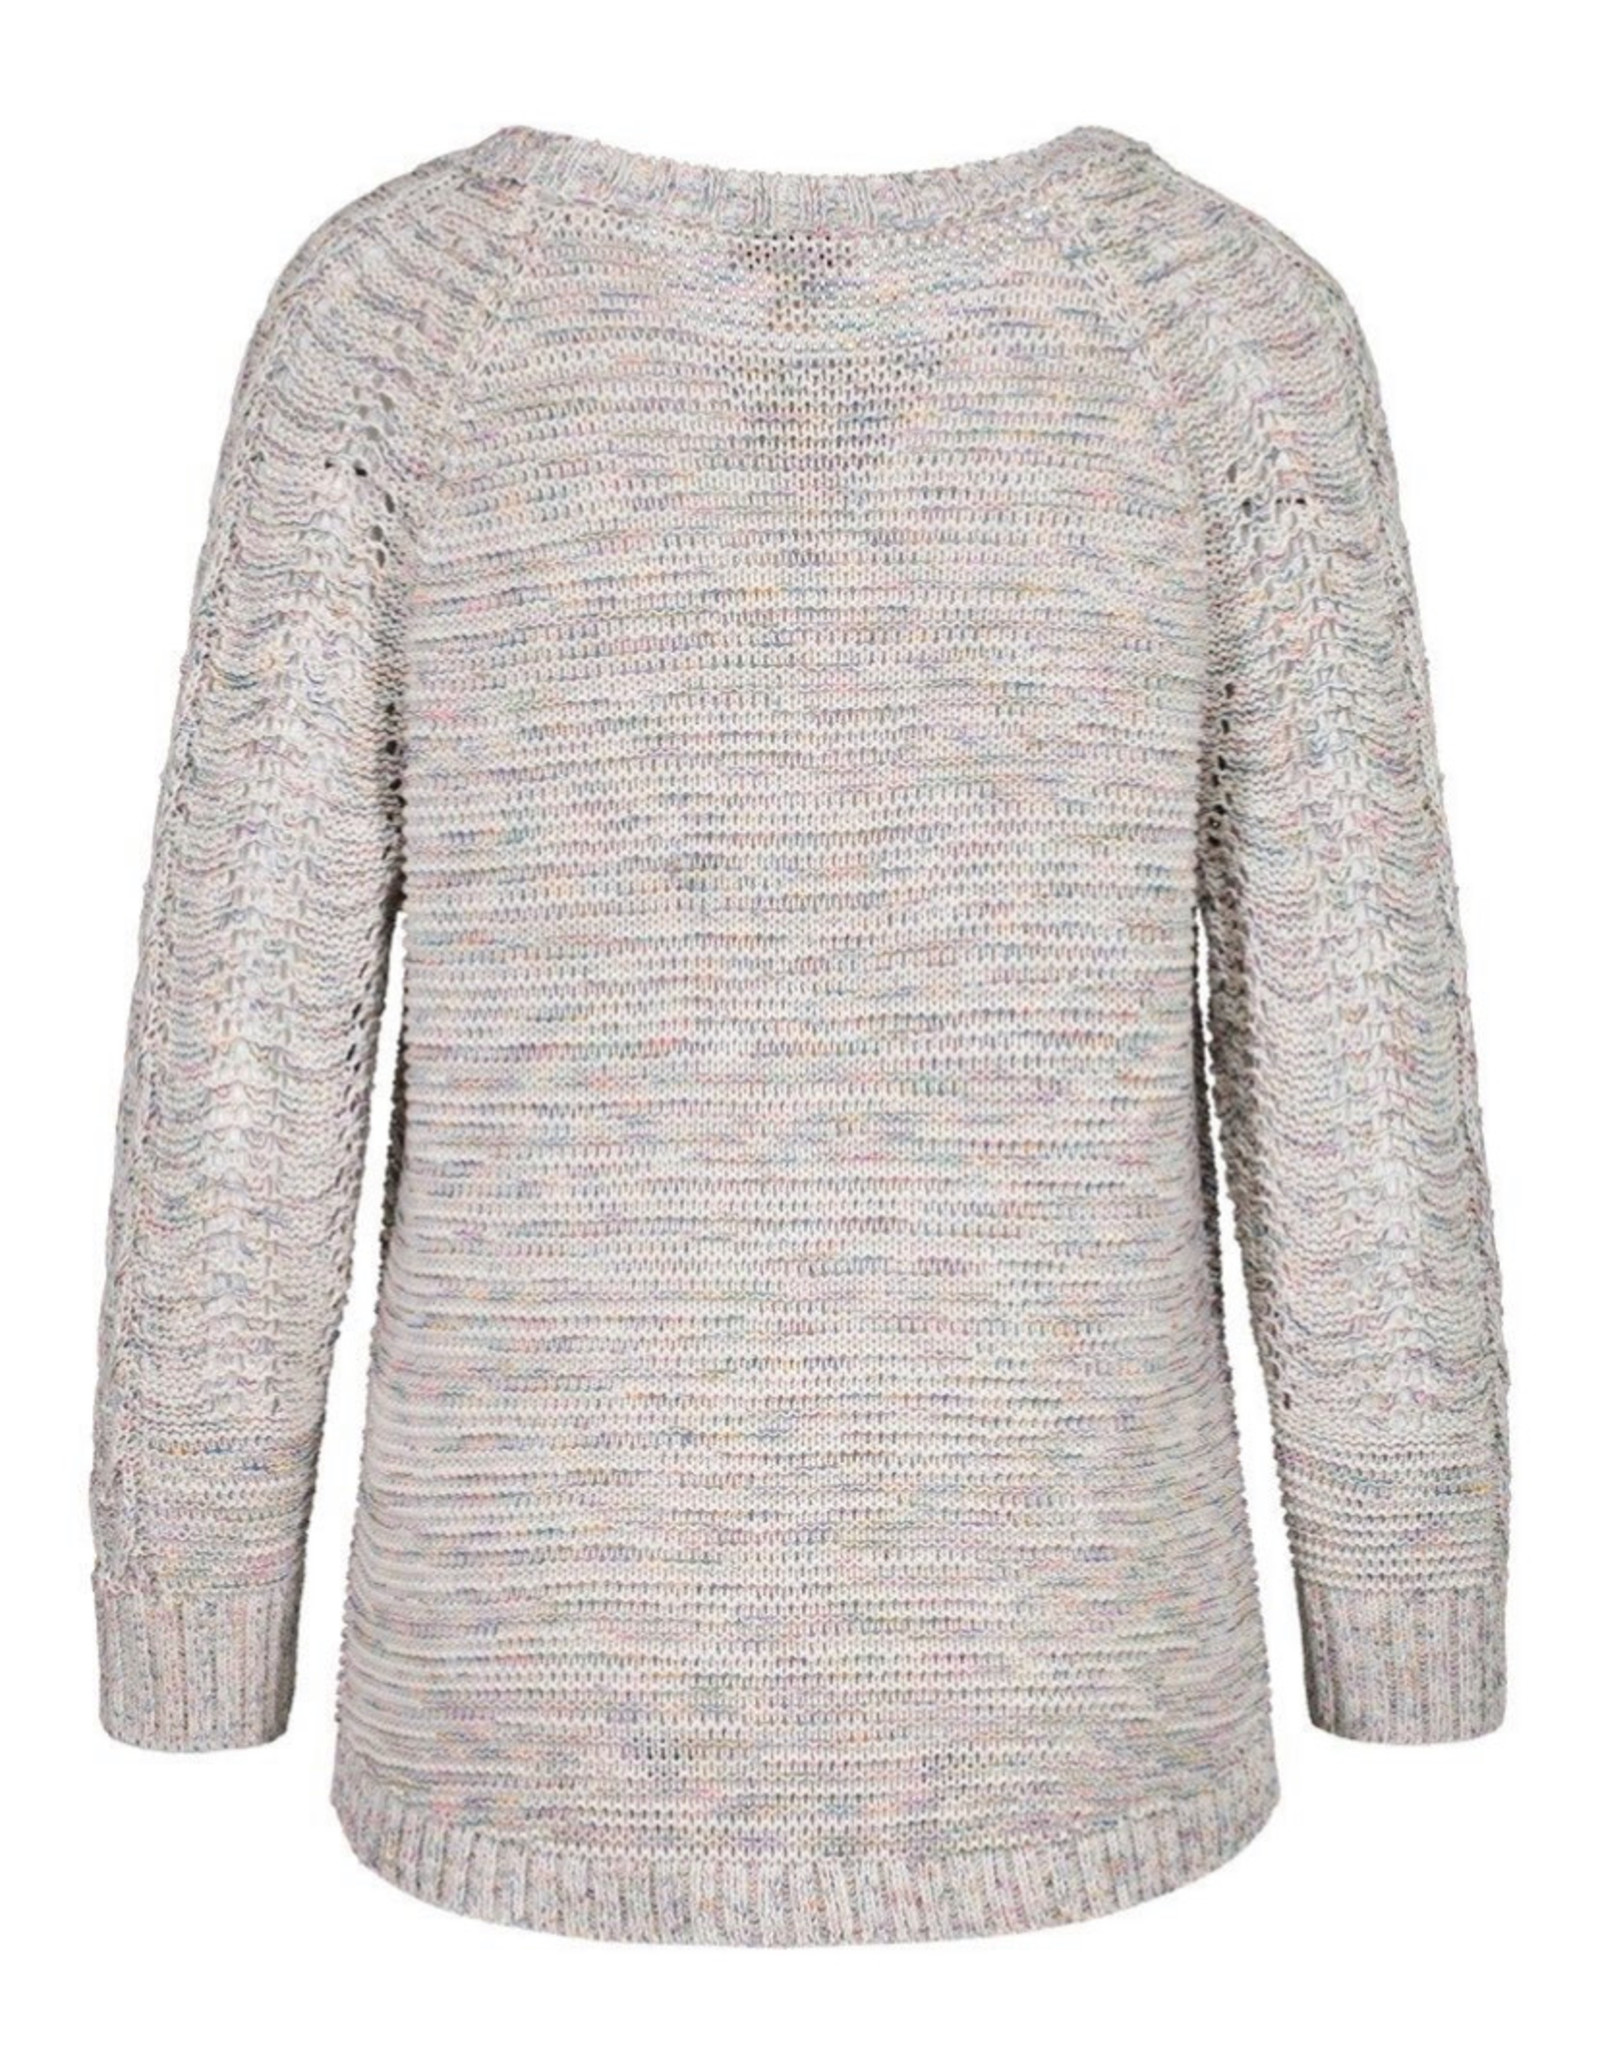 3/4 sleeve scoopneck sweater